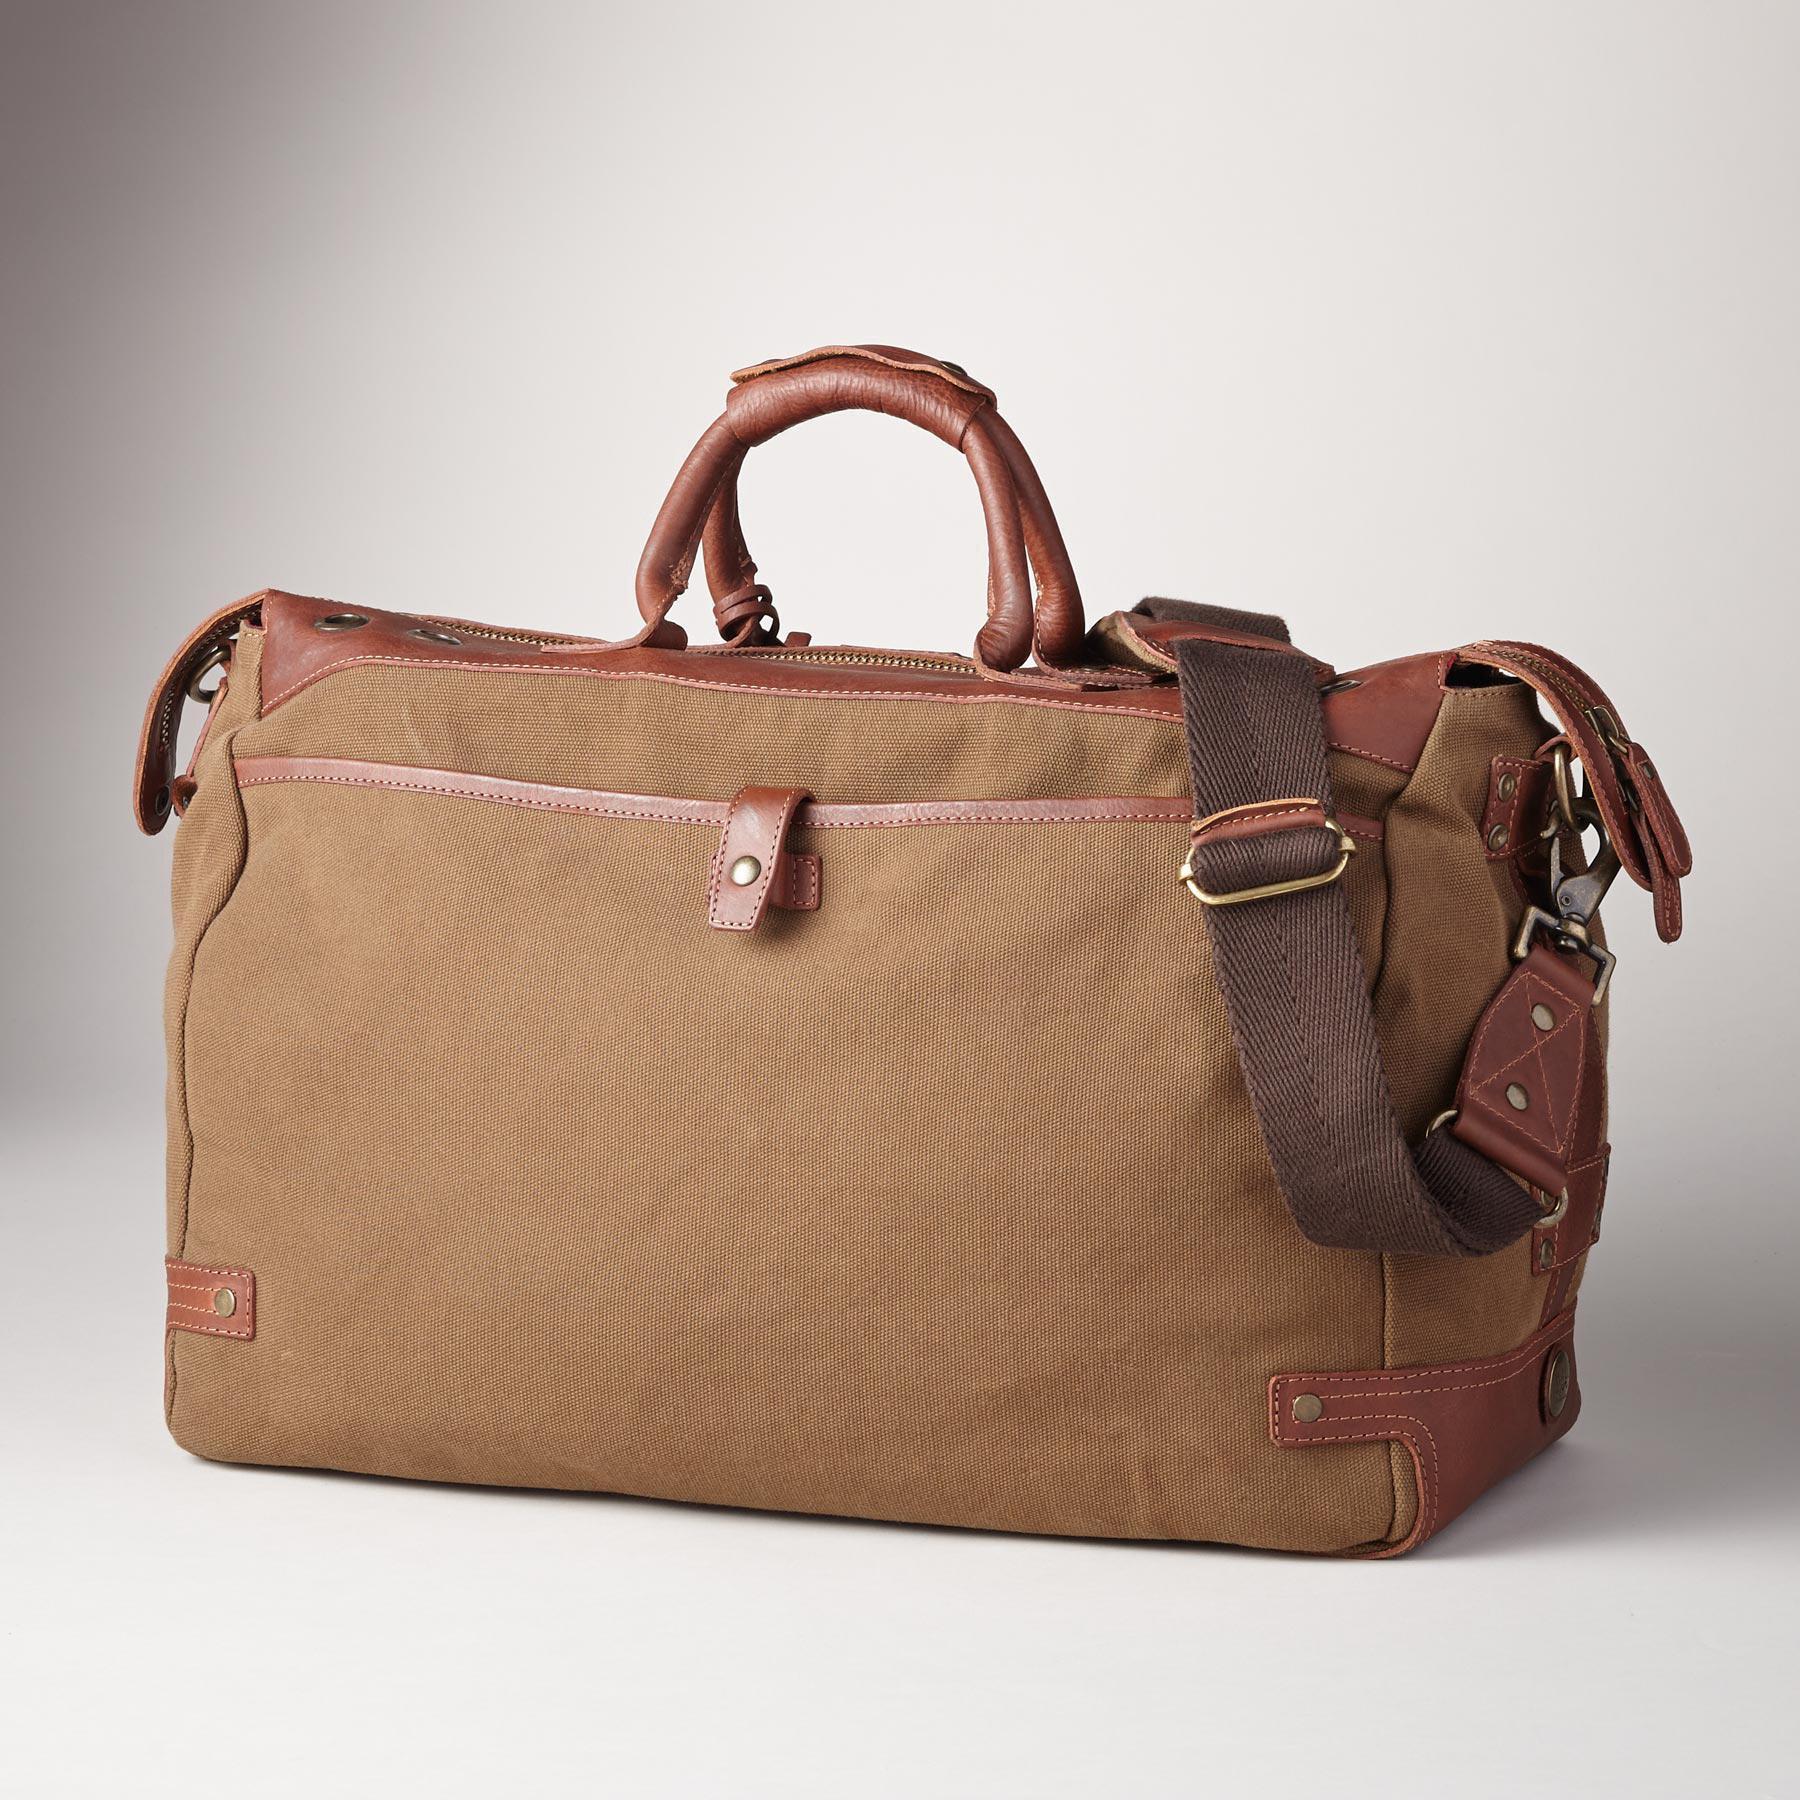 Venerations Duffle Bag: View 2